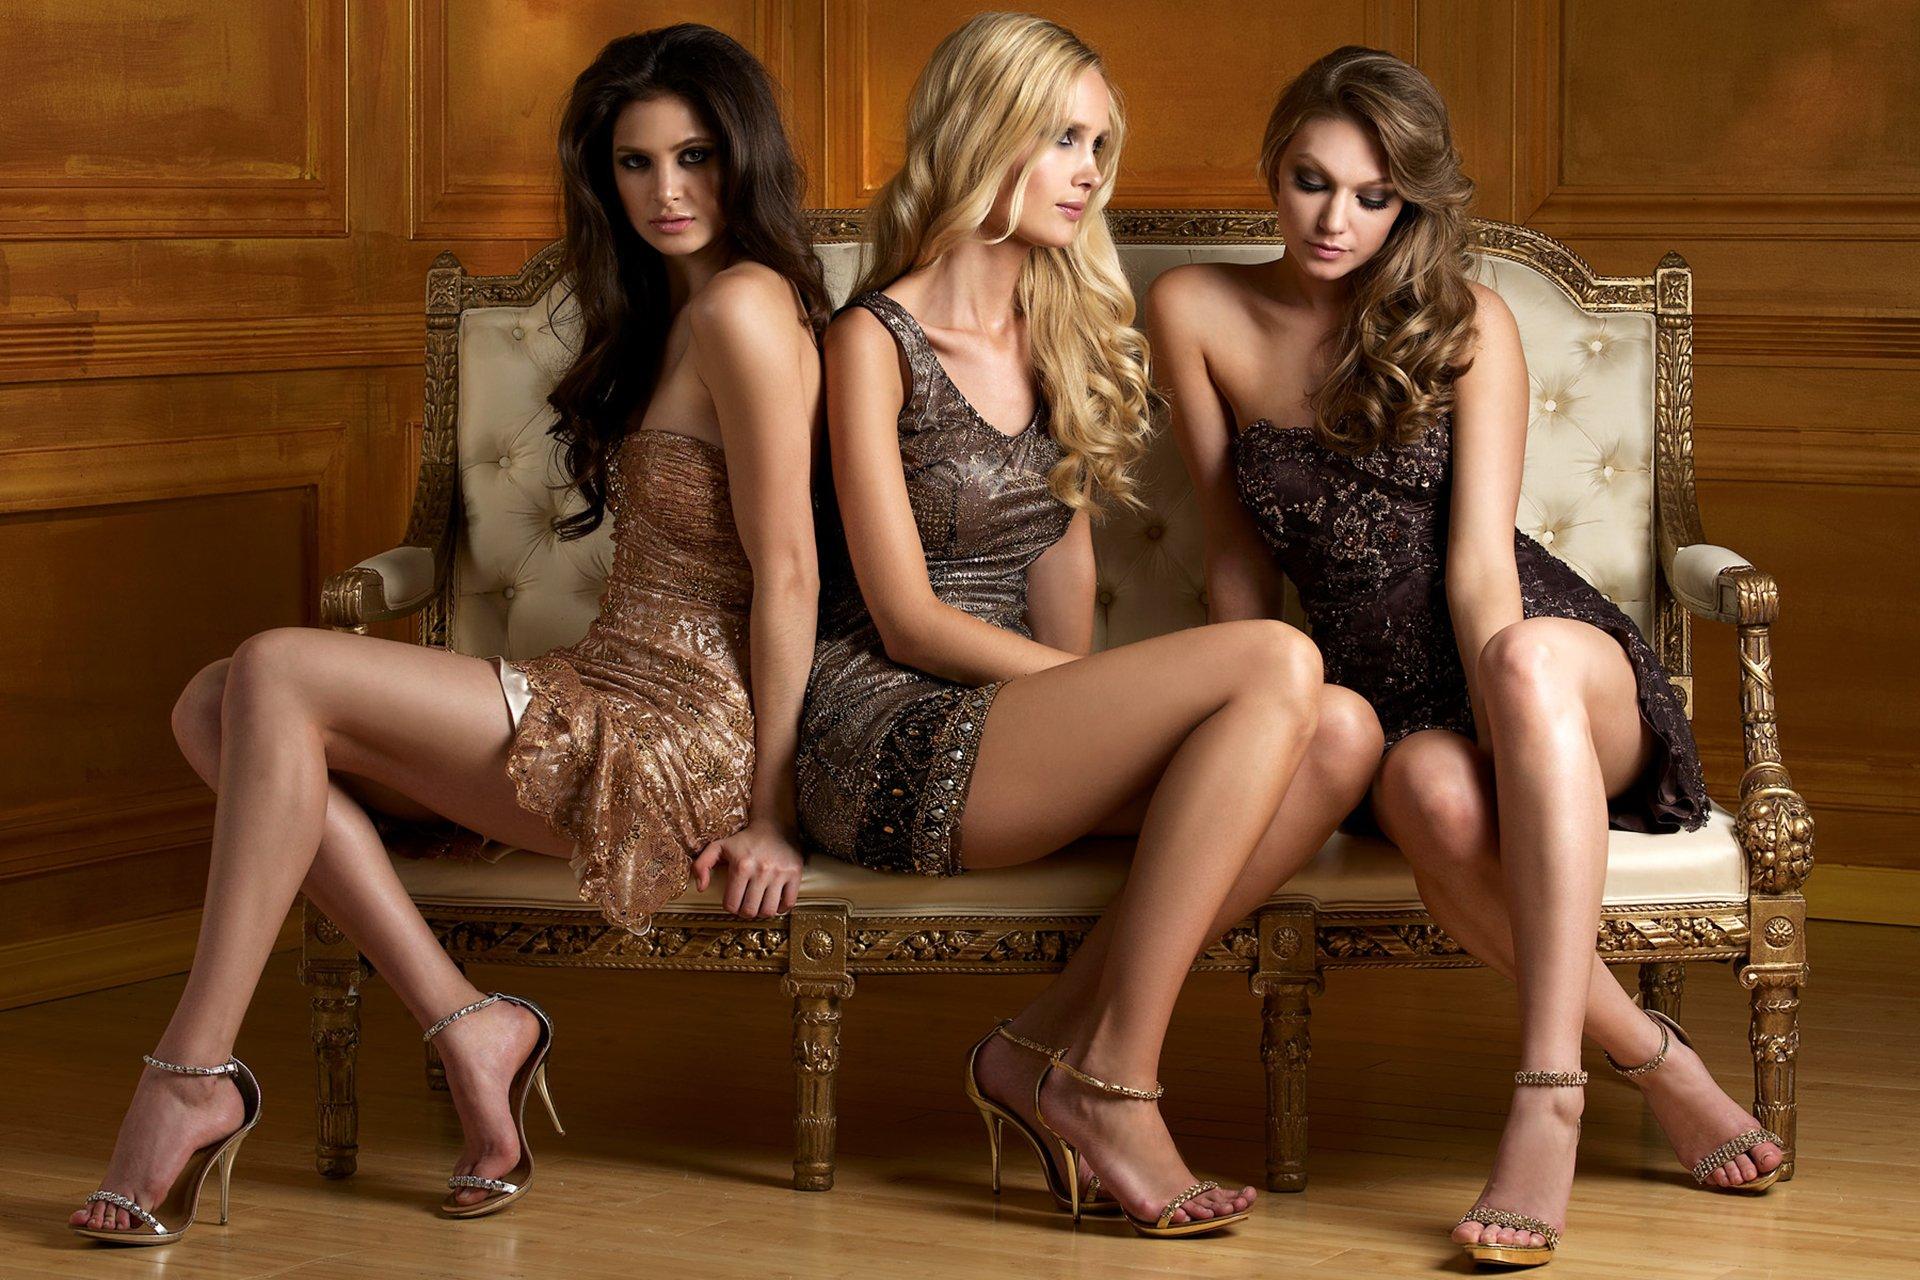 Секс троих девчонок фильм романтик онлайн